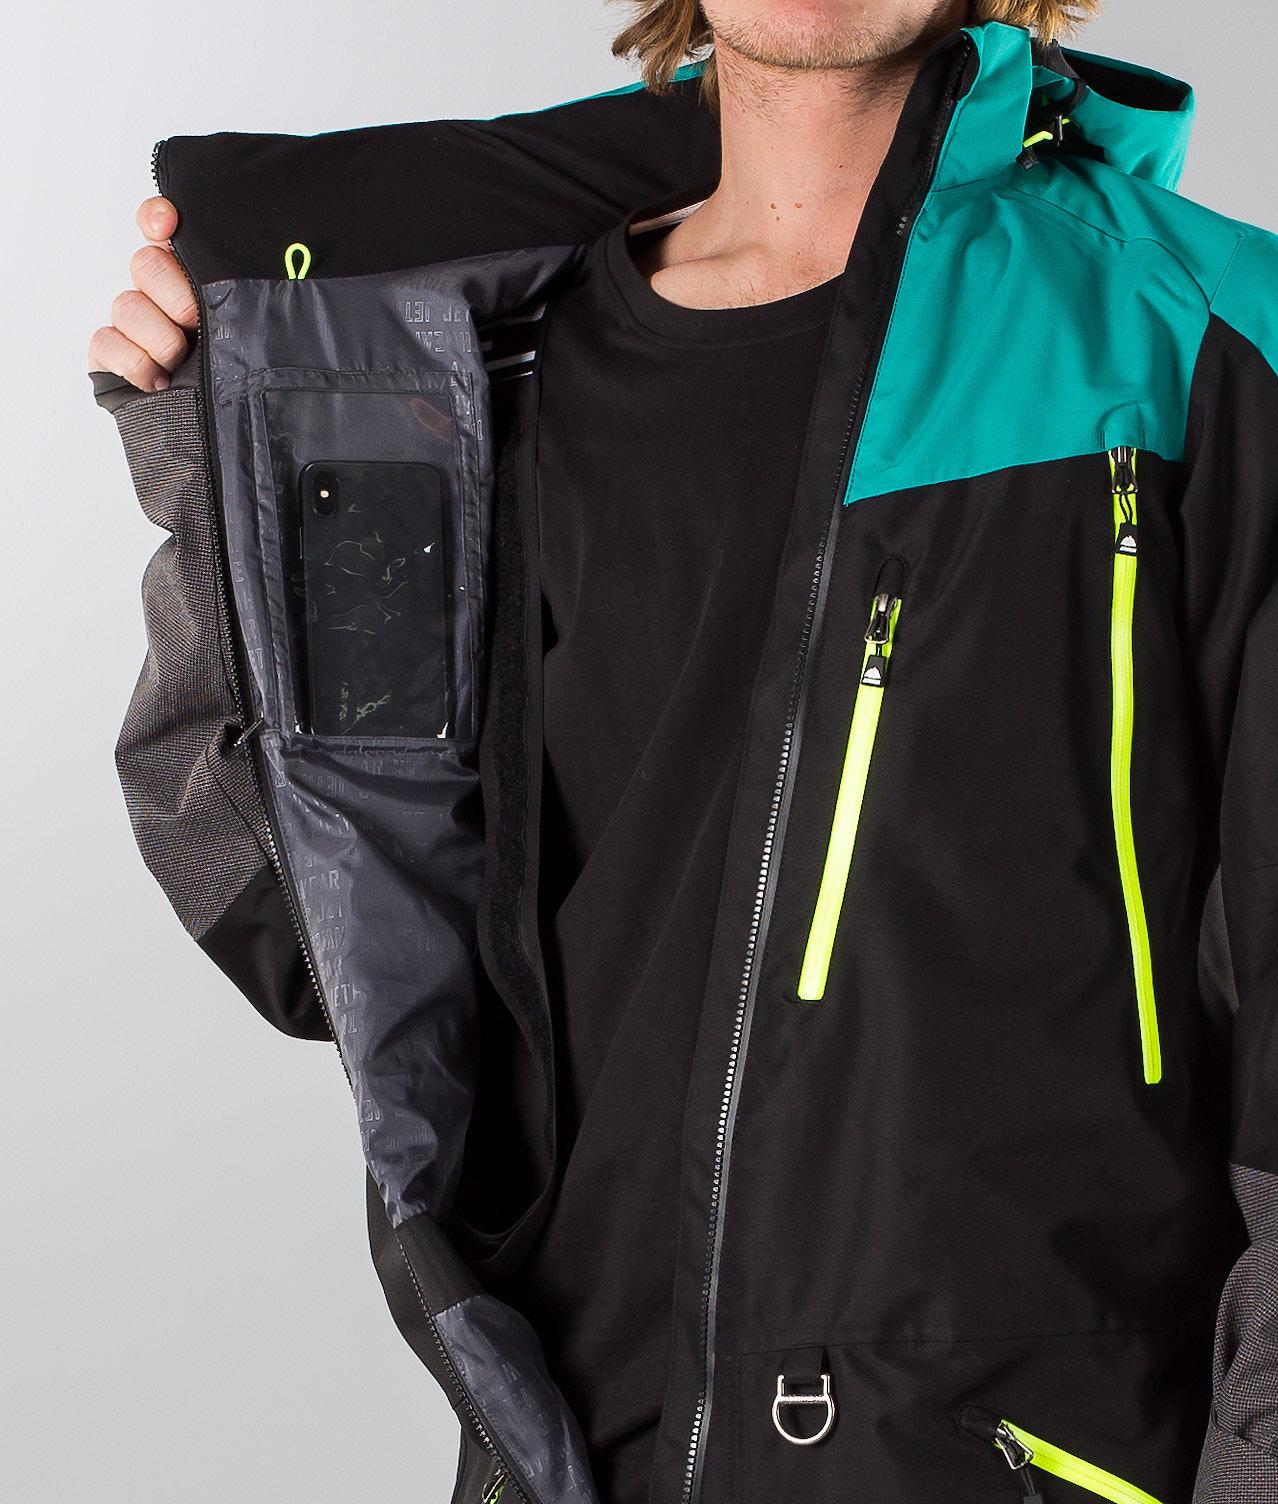 Jethwear Freedom Suit Overall 6942df1f004b9